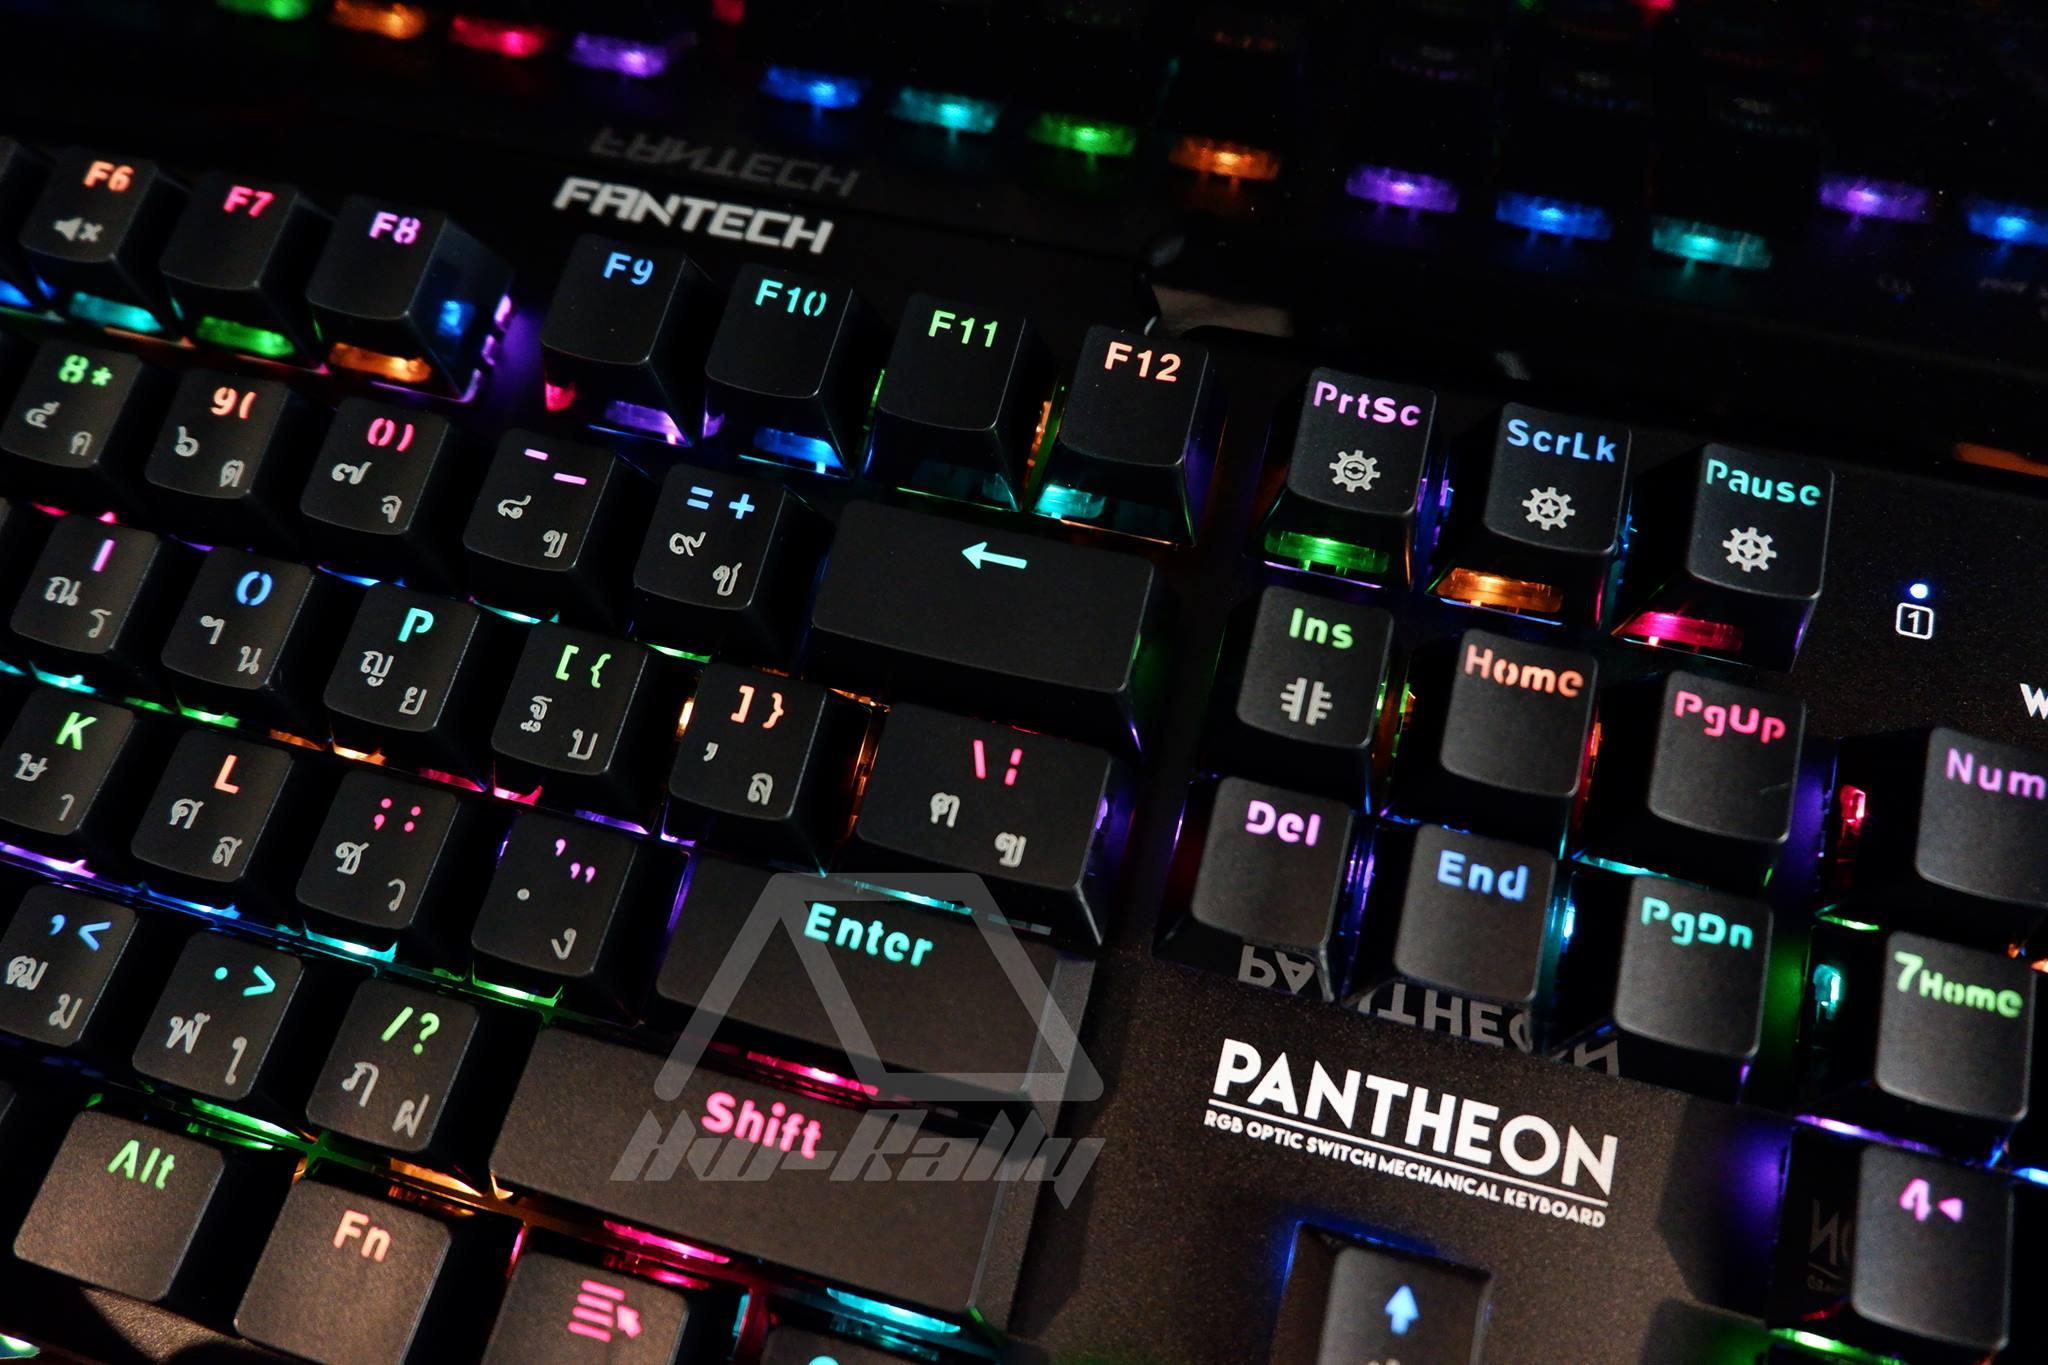 FANTECH MK-882 ออฟติคอลสวิชต์ แบบกันน้ำ ไฟ RGB